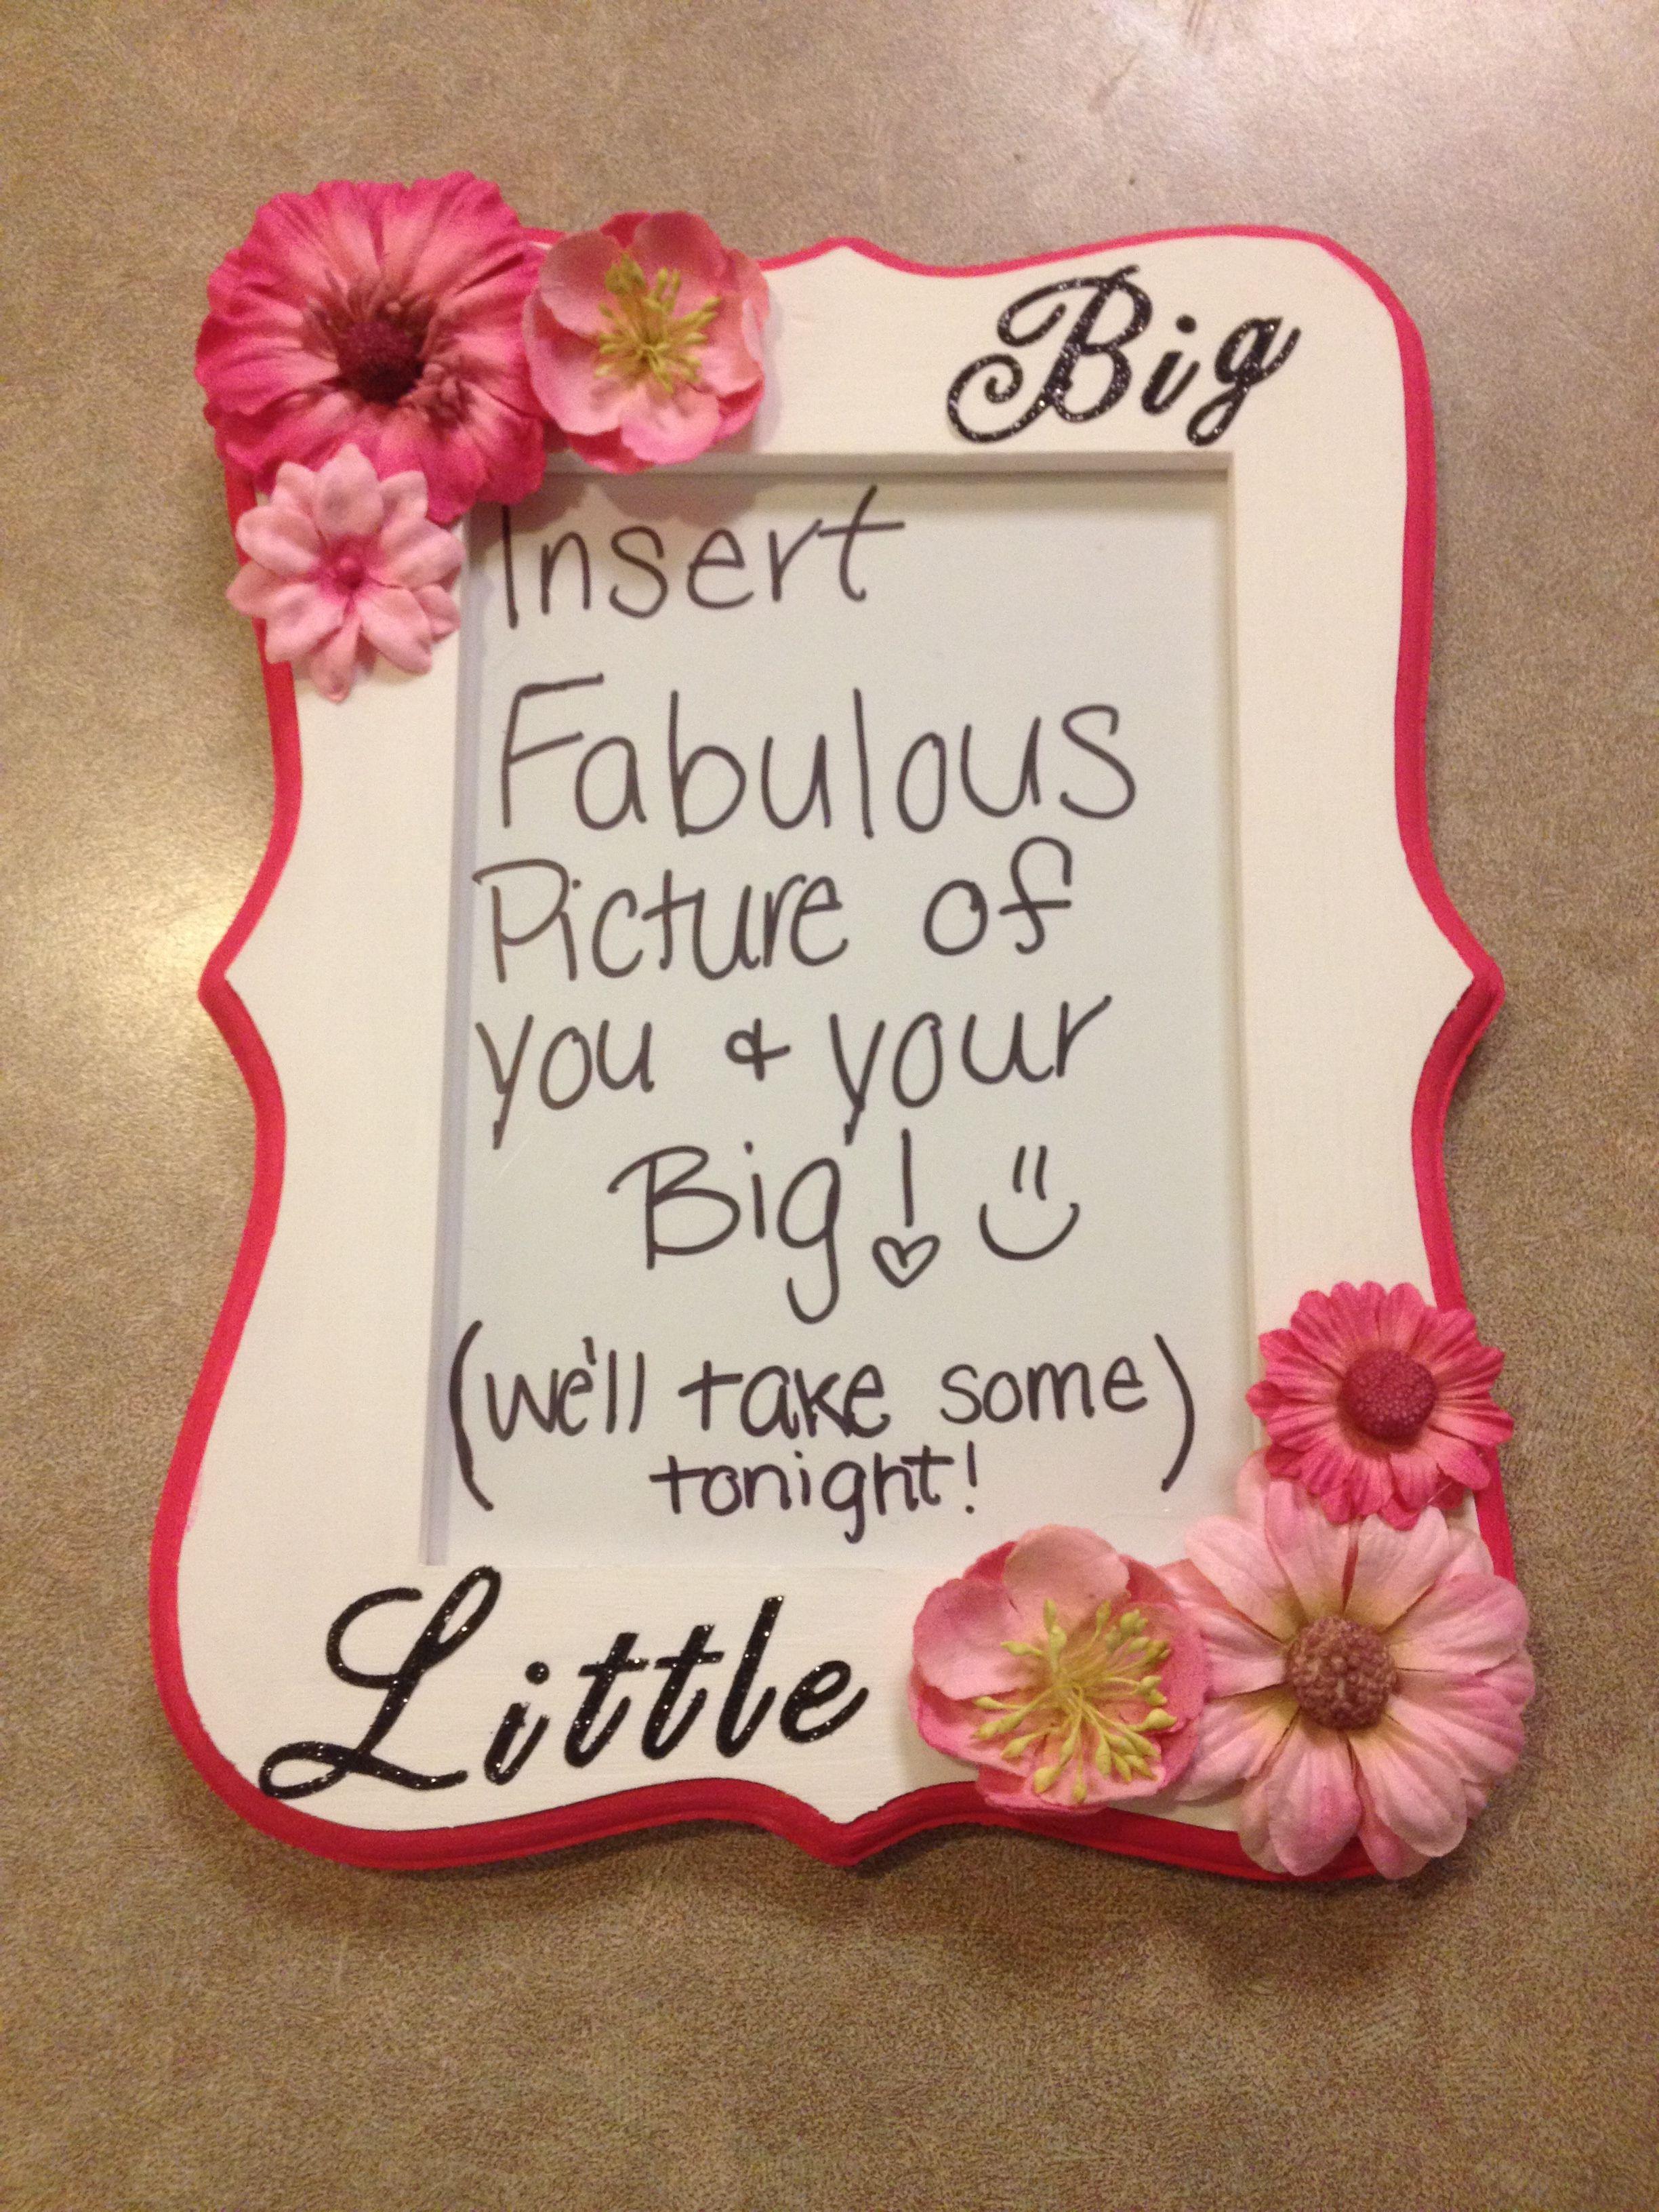 Big little crafts sorority frame sorority pinterest for Sorority crafts for little